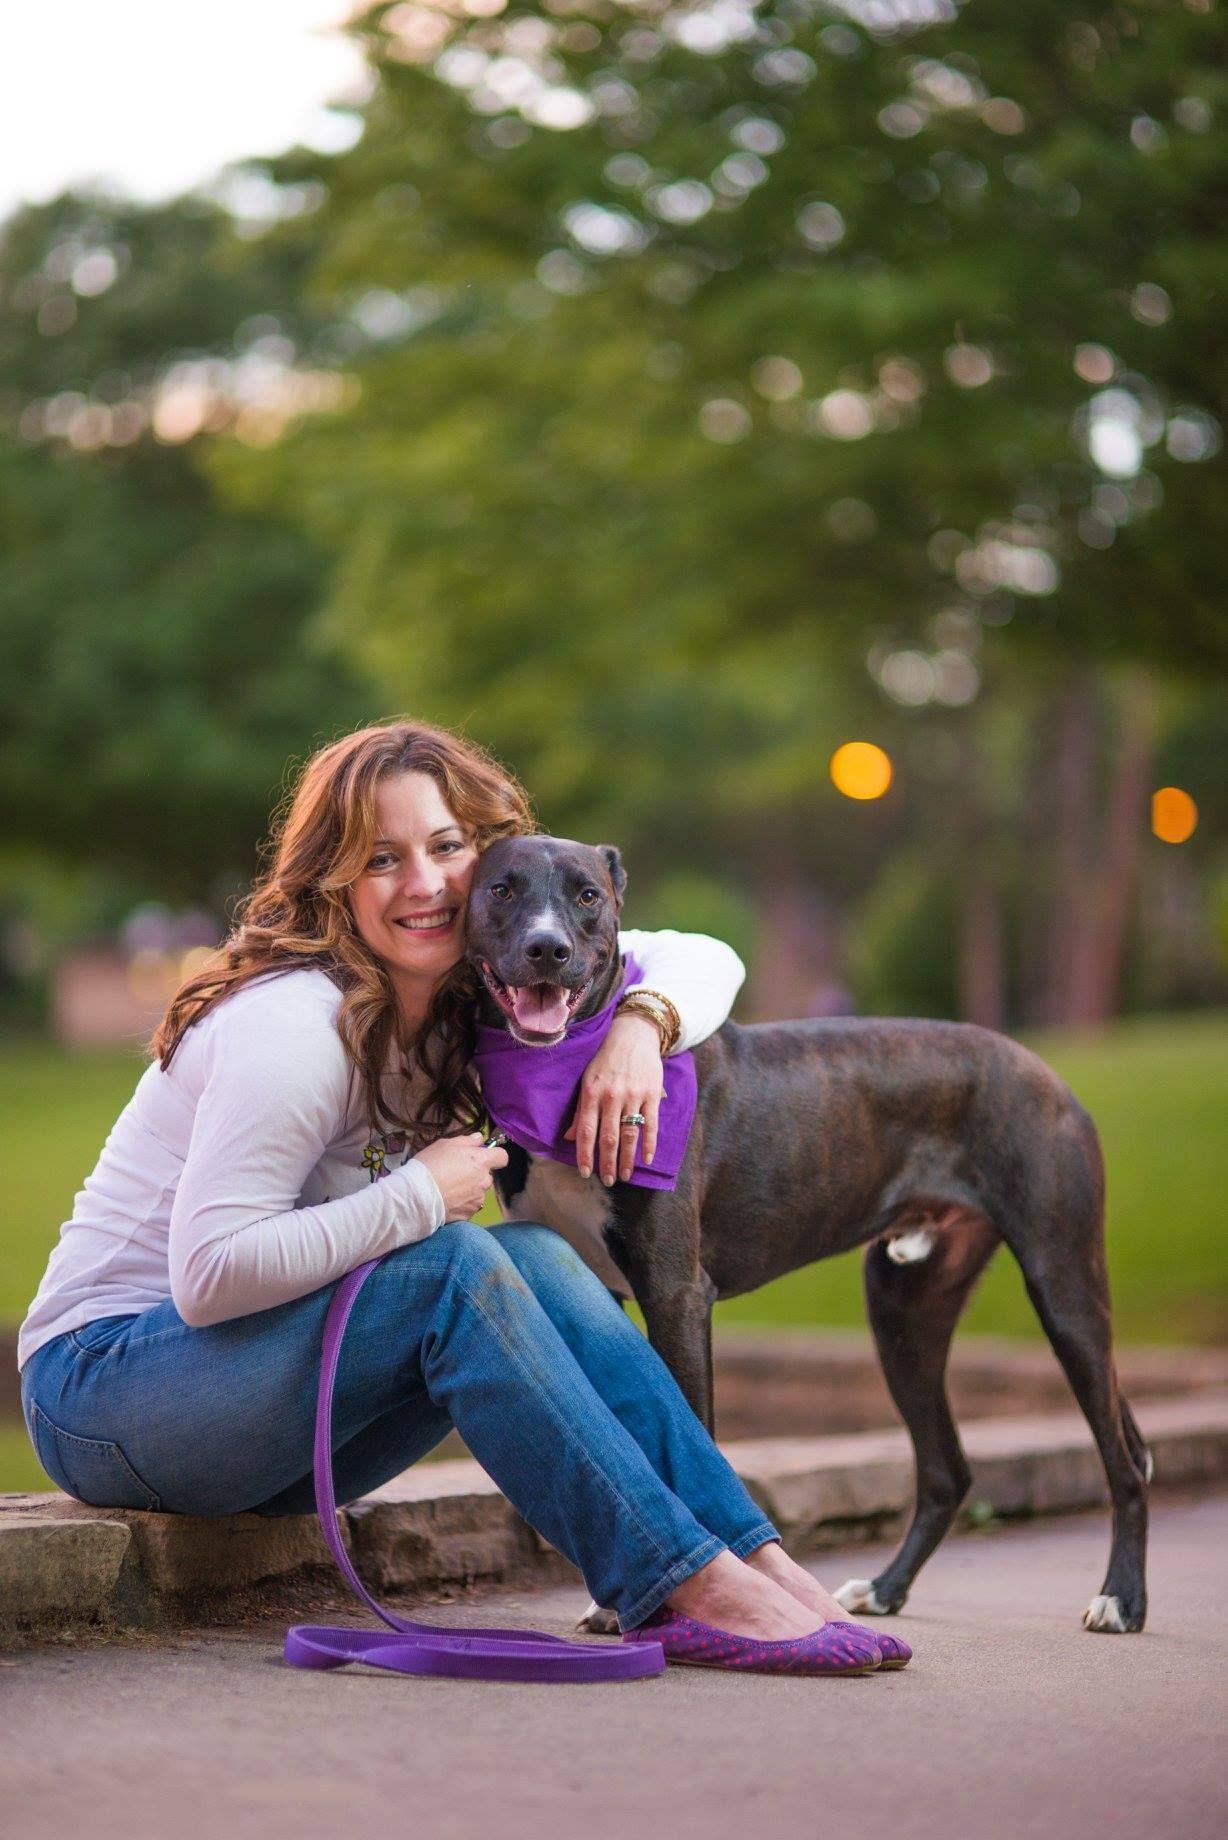 Baltimore Dog Walking, Daycare, Grooming & Cat Care Dog